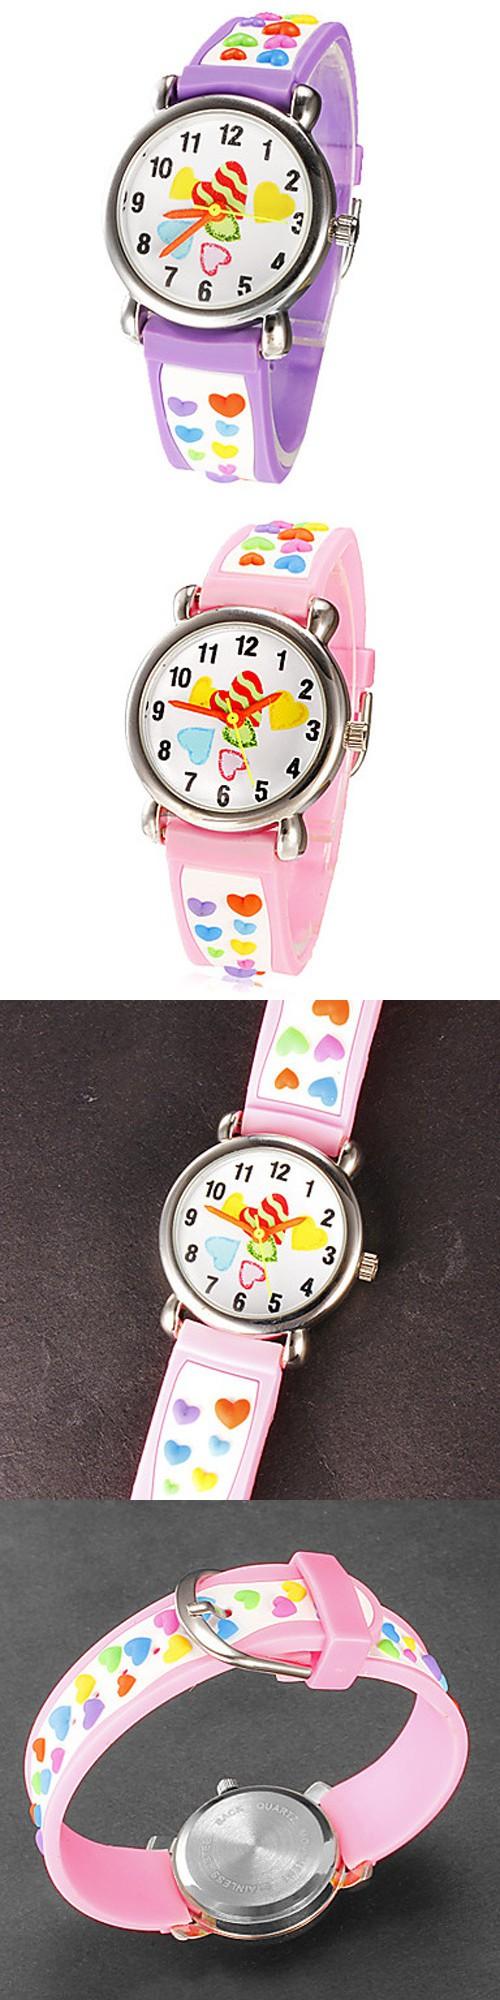 Children Silicone Wristwatches hearts Fashion Casual Reloj Waterproof Kid Watches Brand Quartz Wrist Watch Baby For Girls Boys